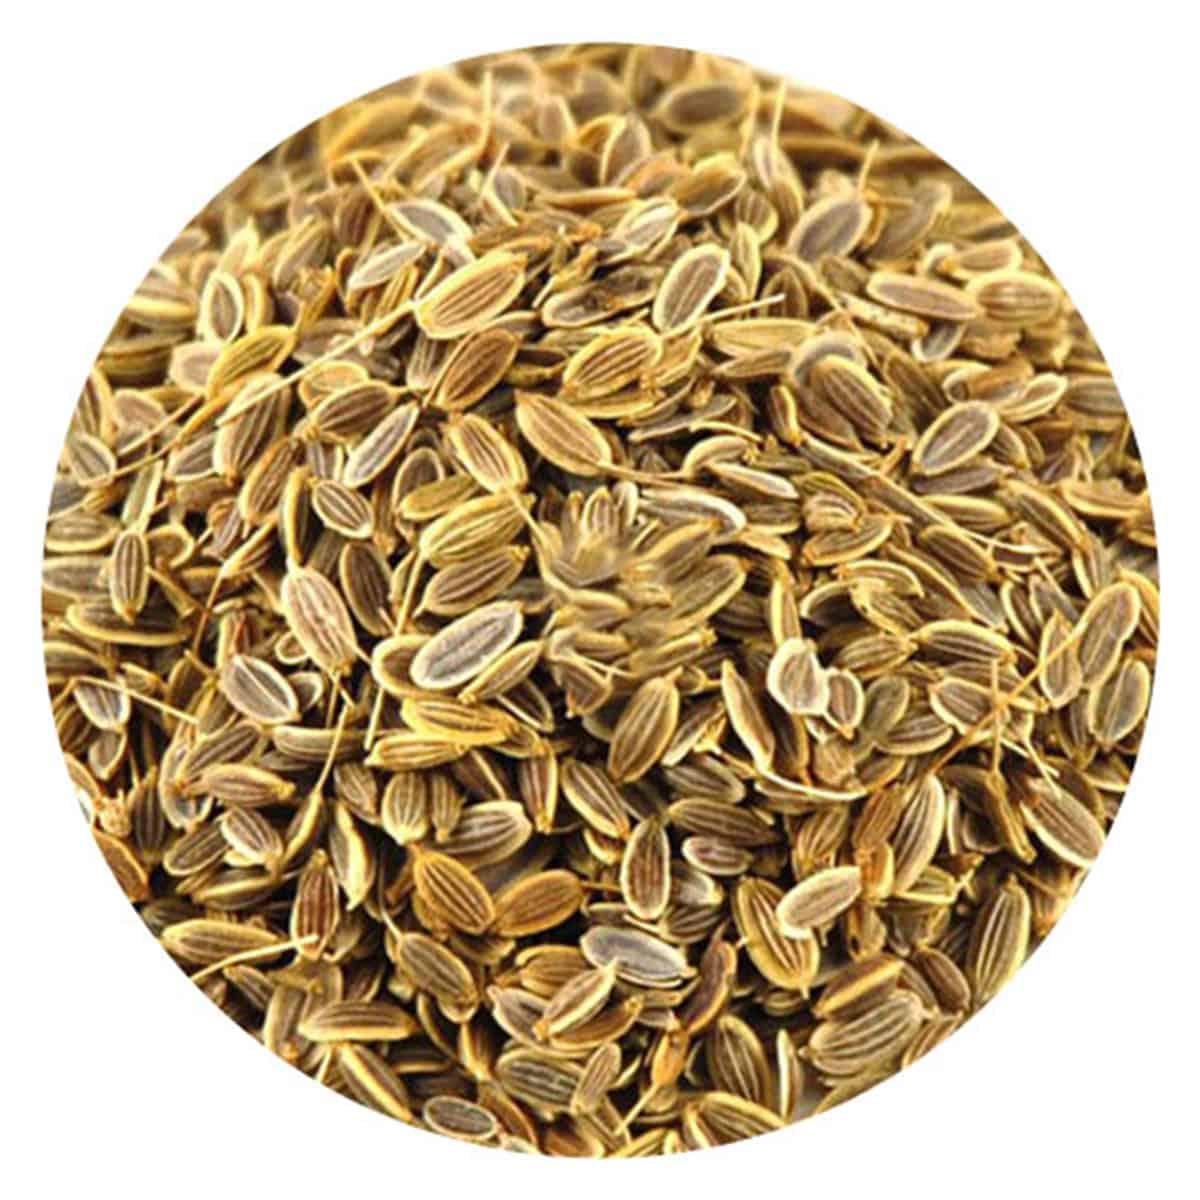 Buy IAG Foods Dill Seeds - 1 kg